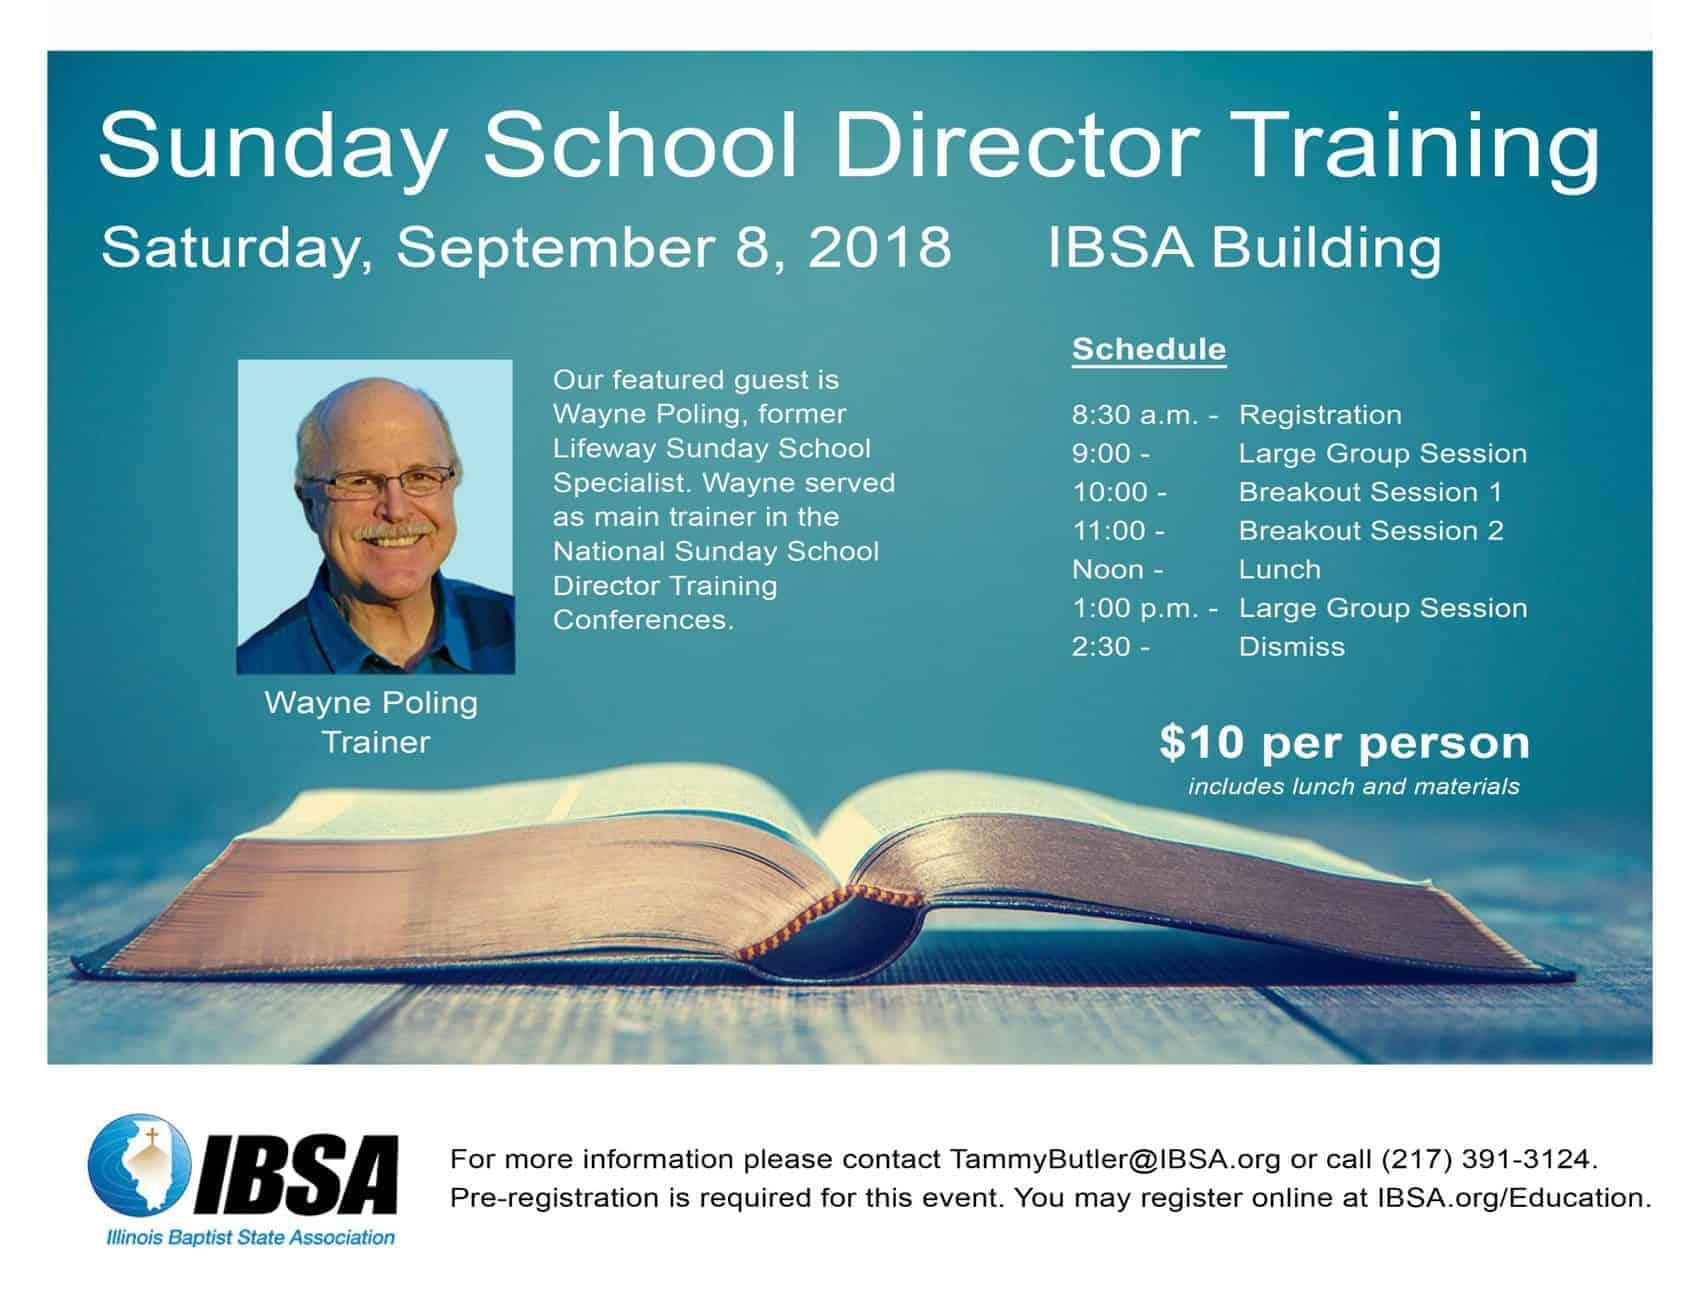 Sunday School Director Training